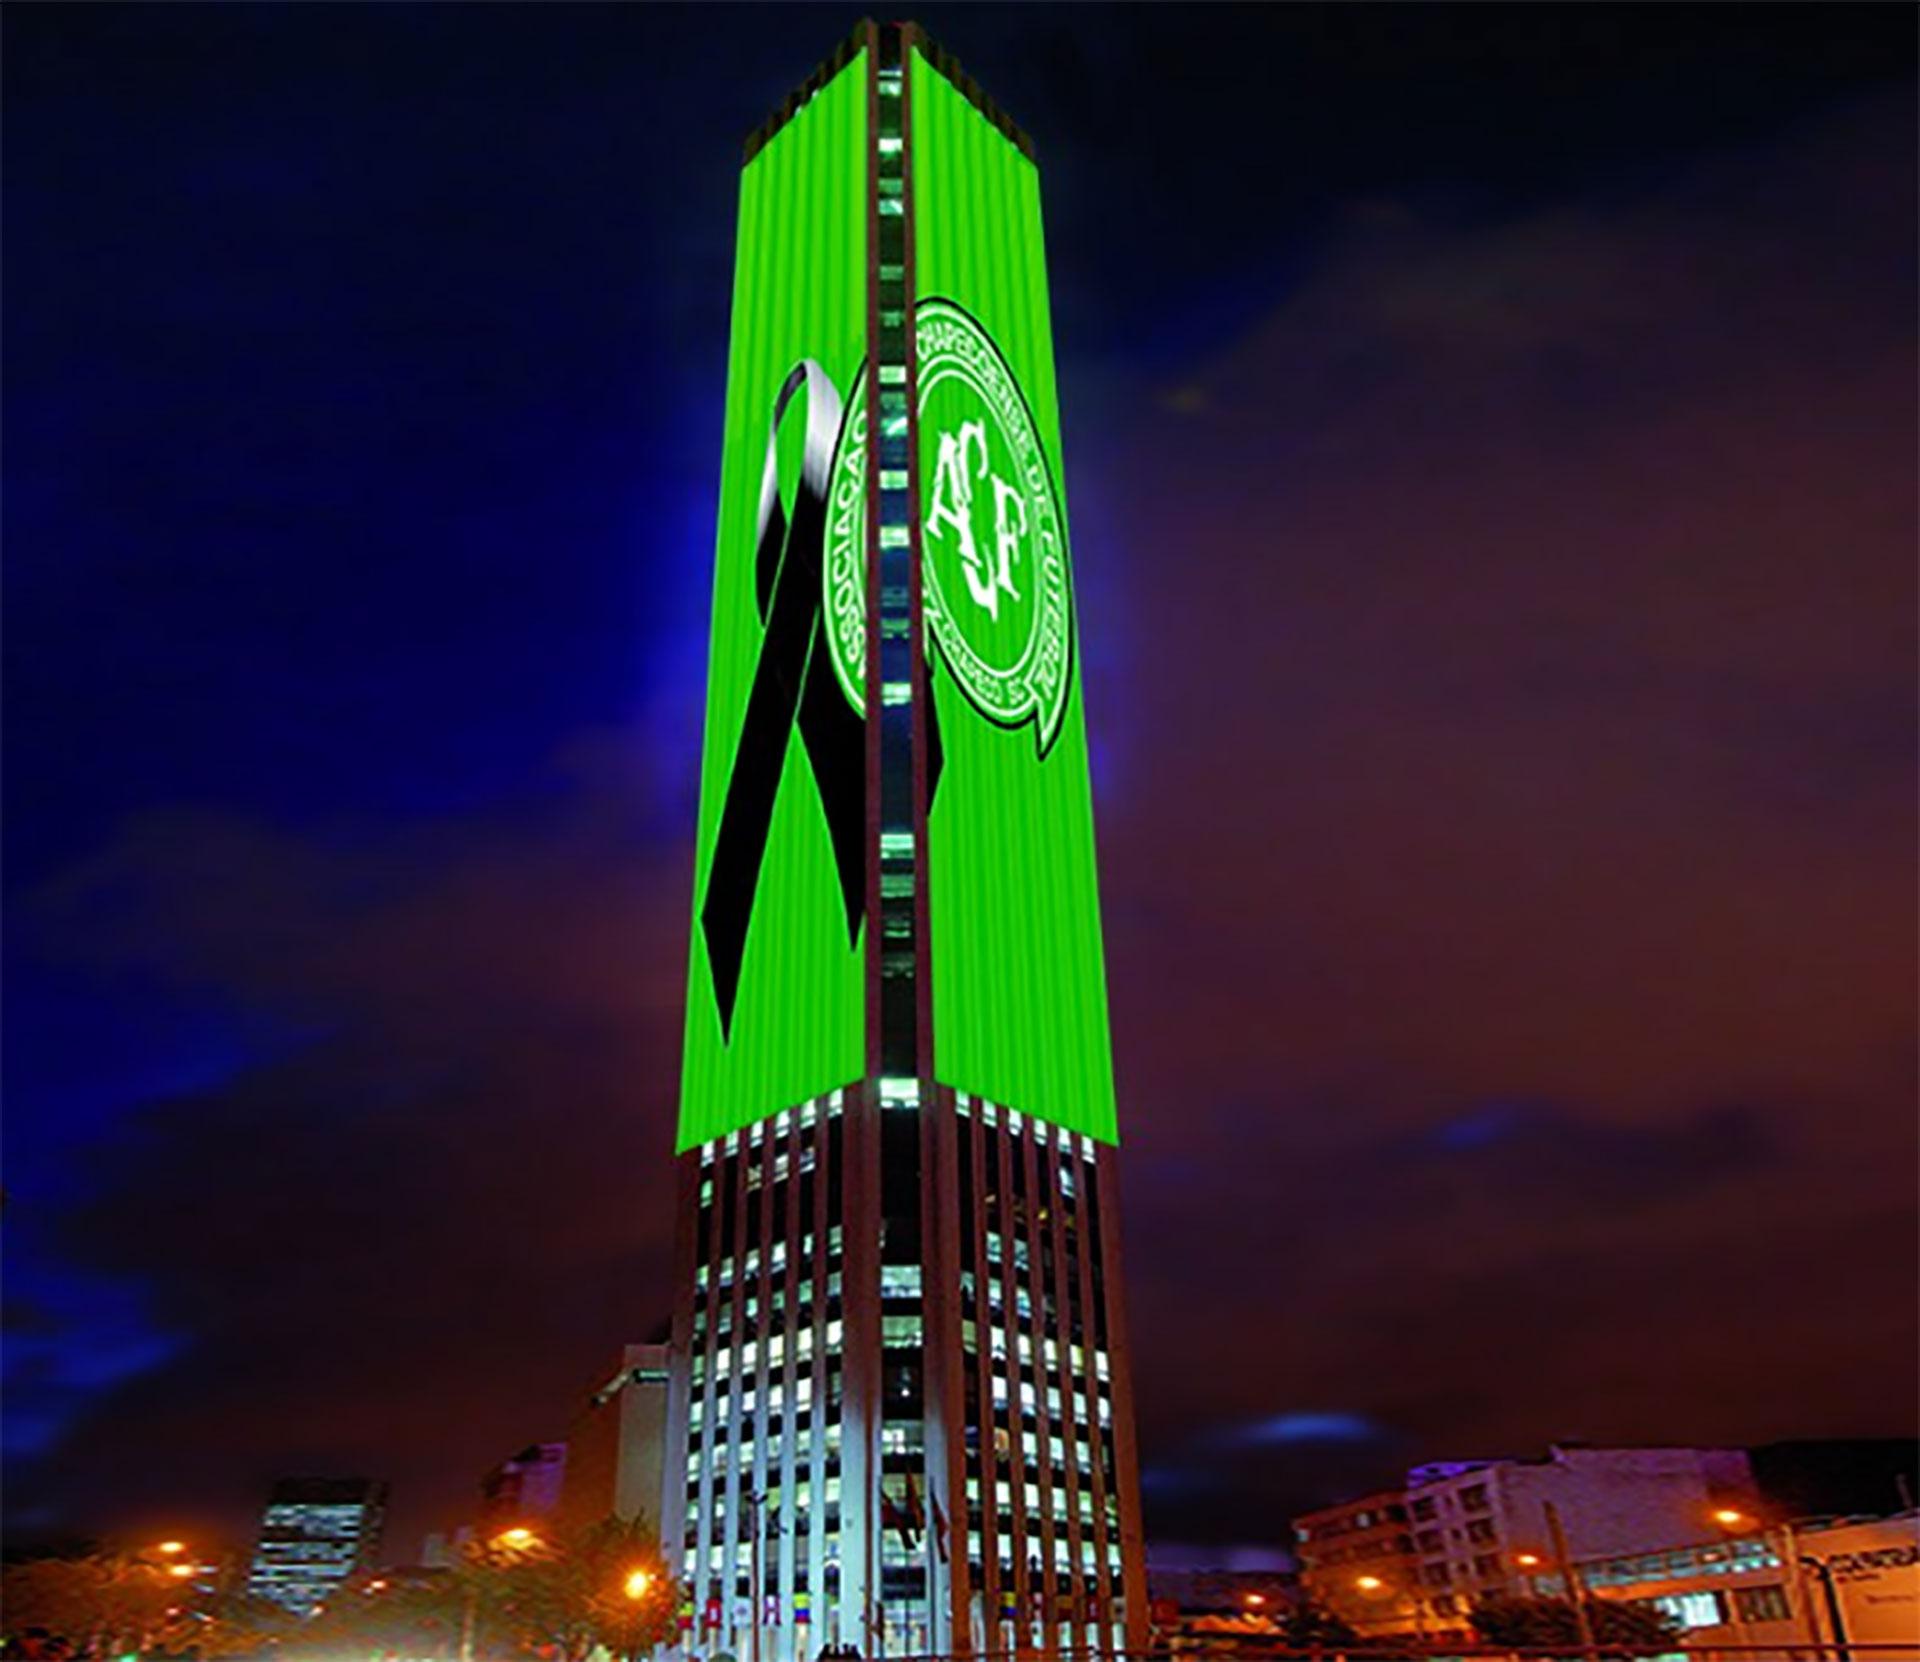 torre-colpatria-bogota-colombia